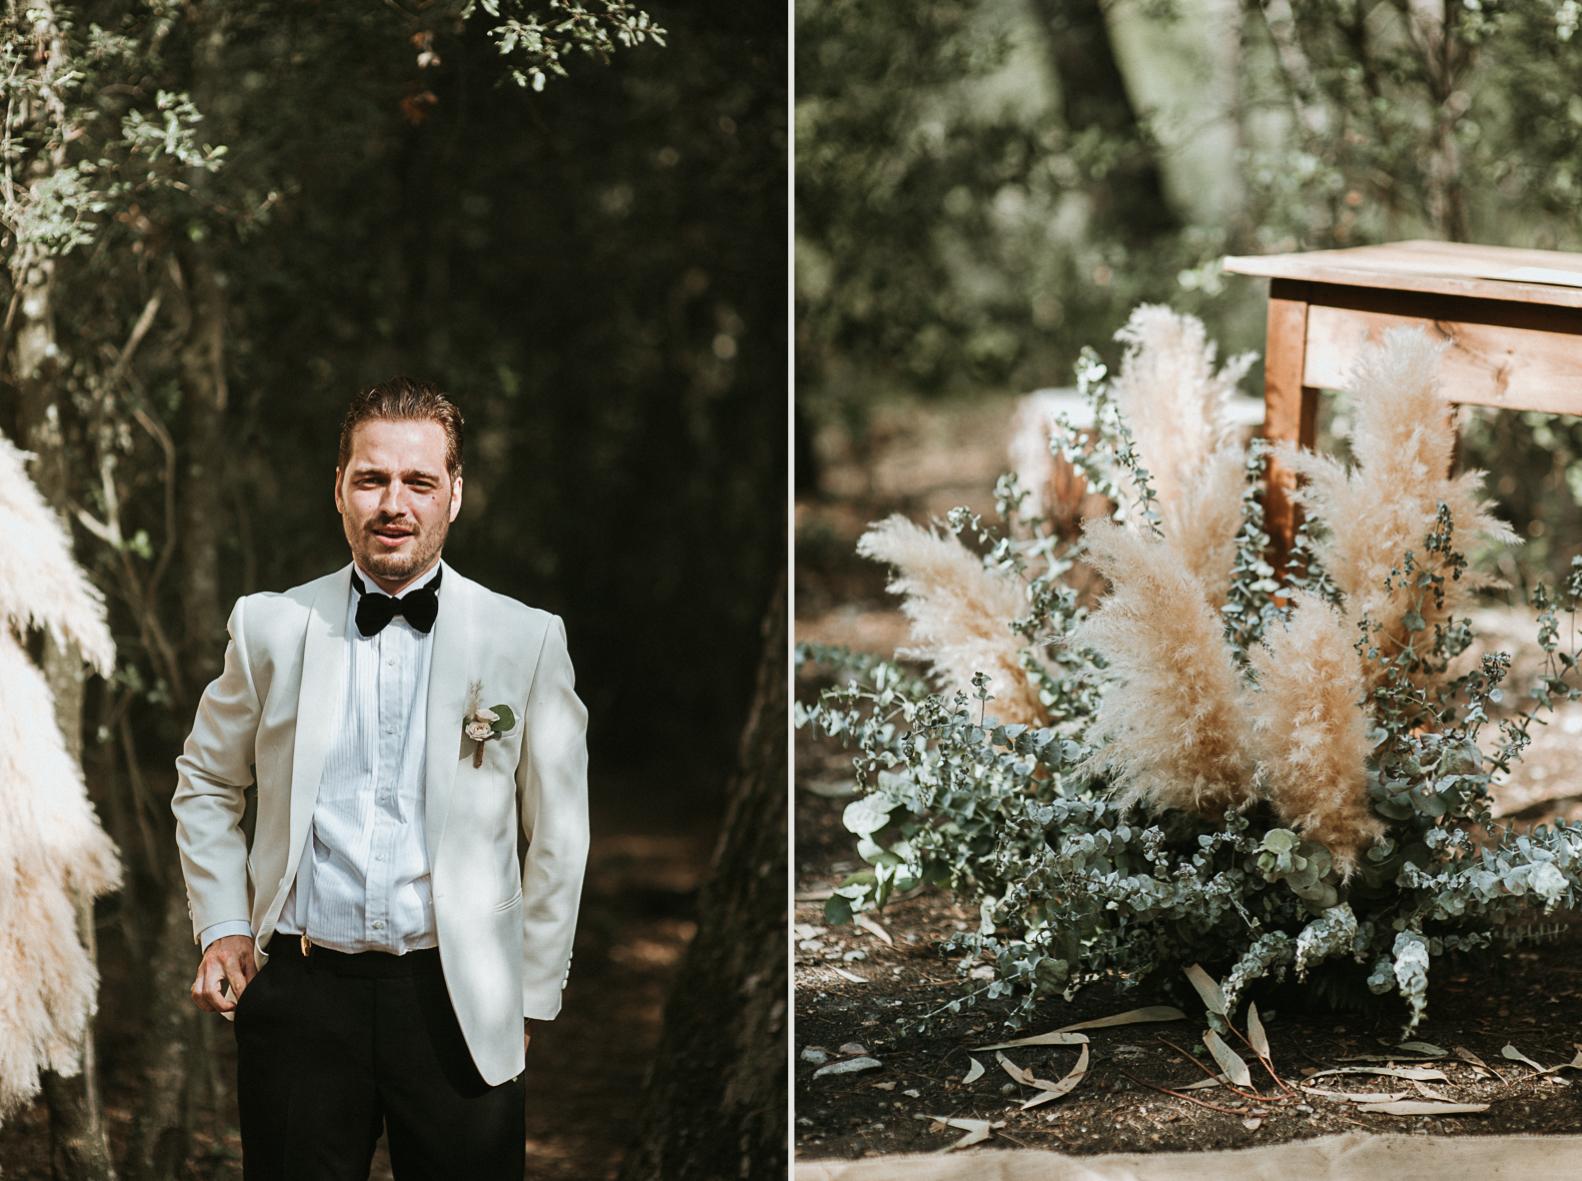 miks-sels-mas-terrats-girona-wedding-photographer-39.1